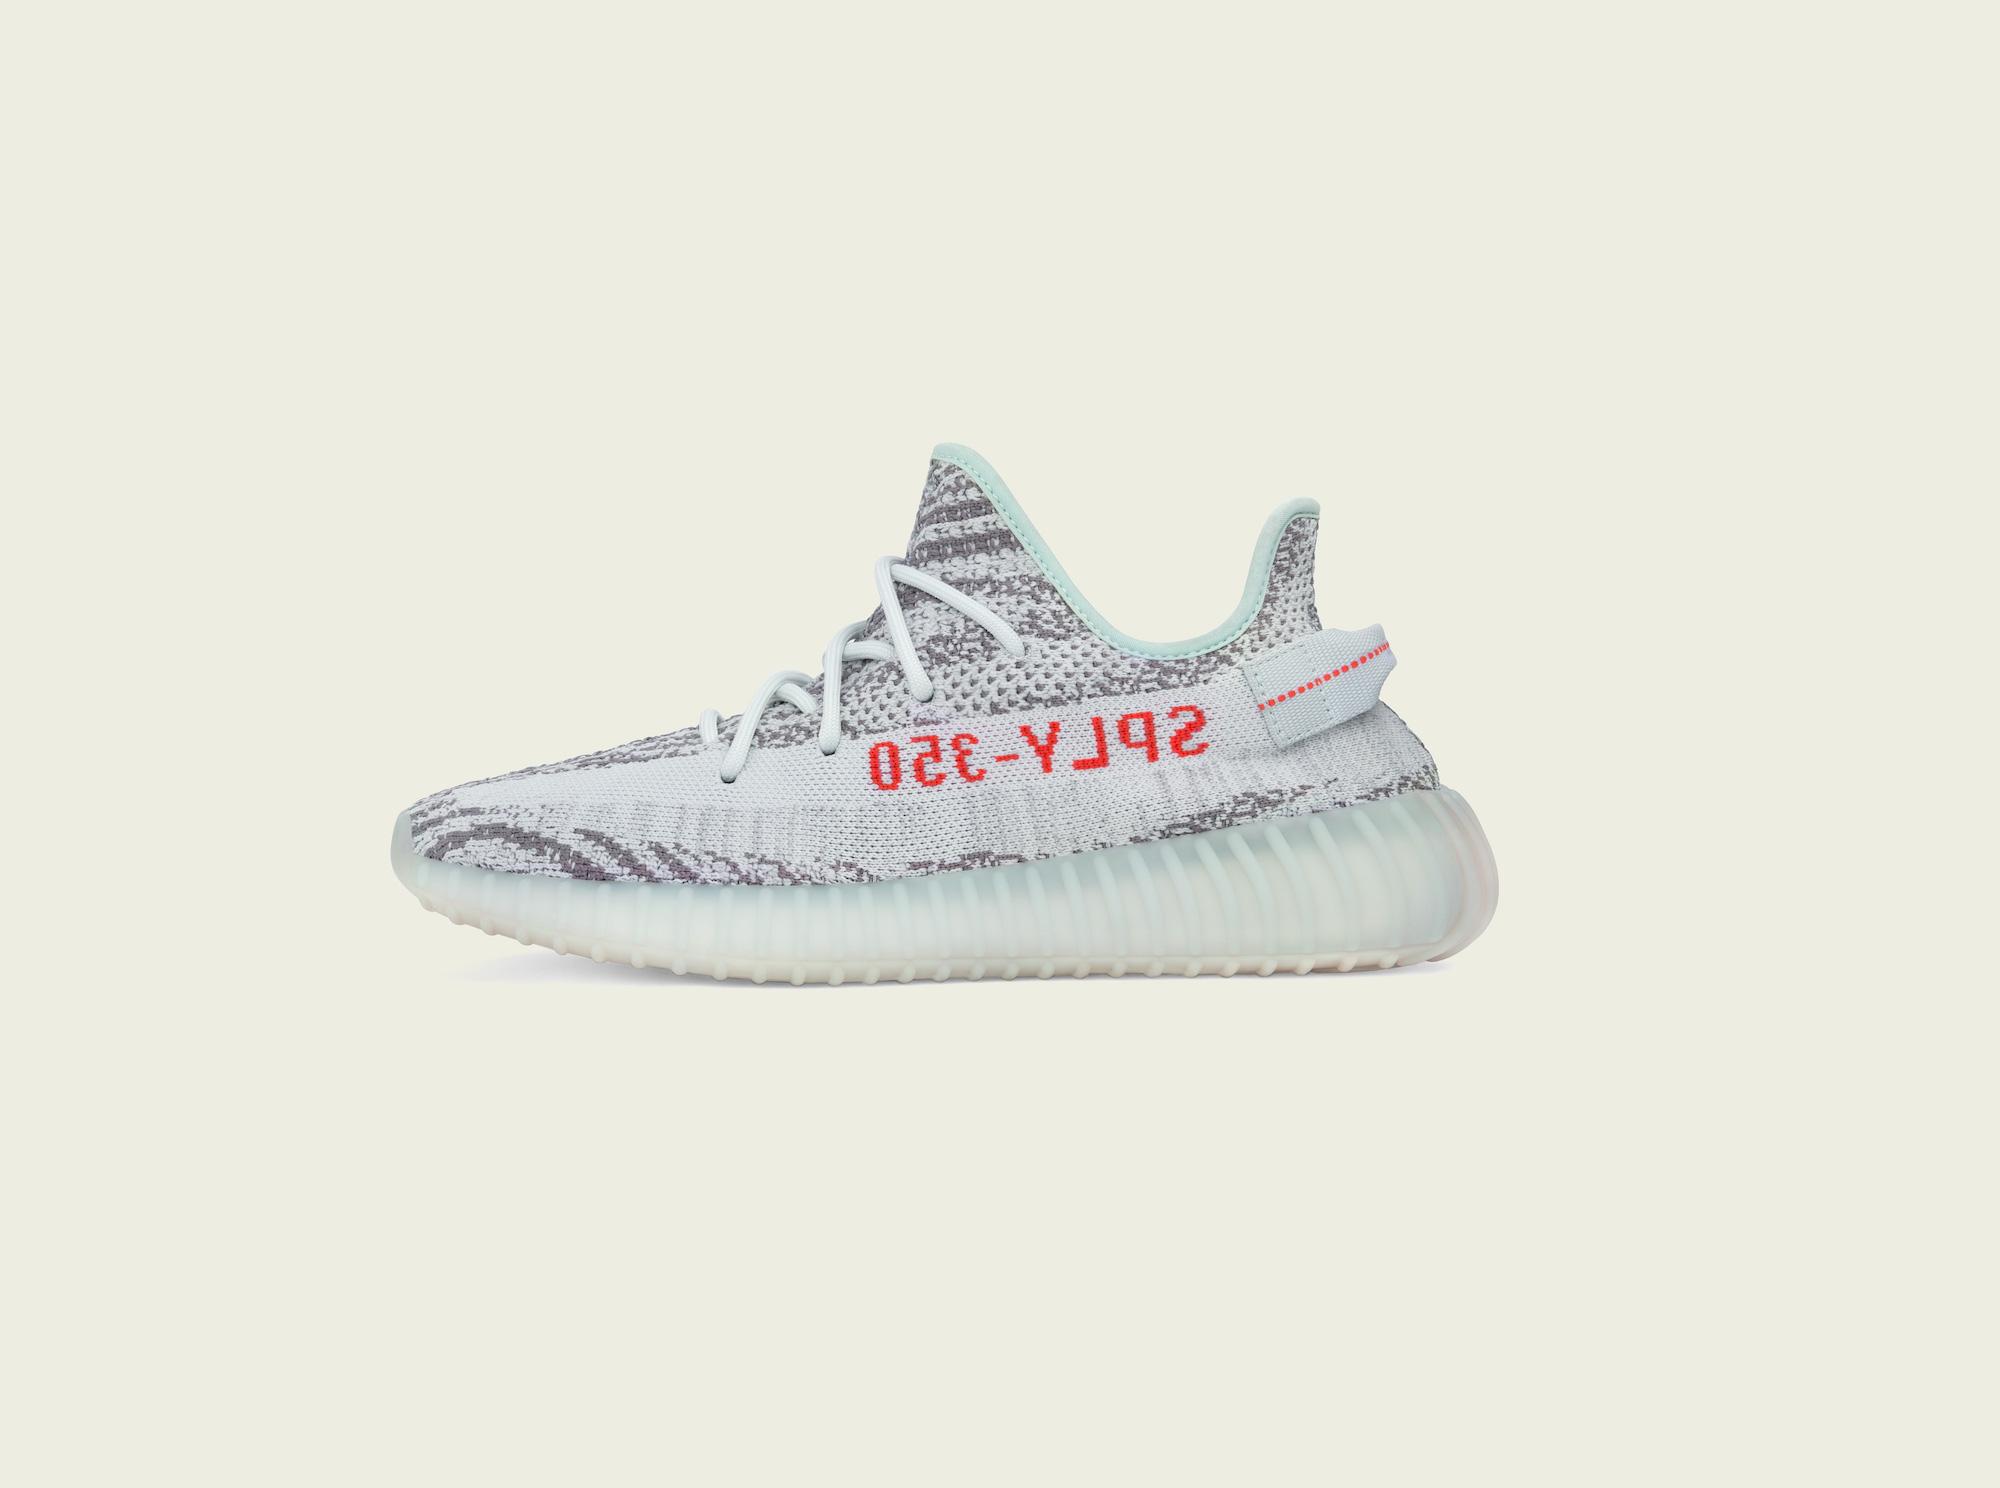 adidas Yeezy Boost 350 V2 Blue Tint 1